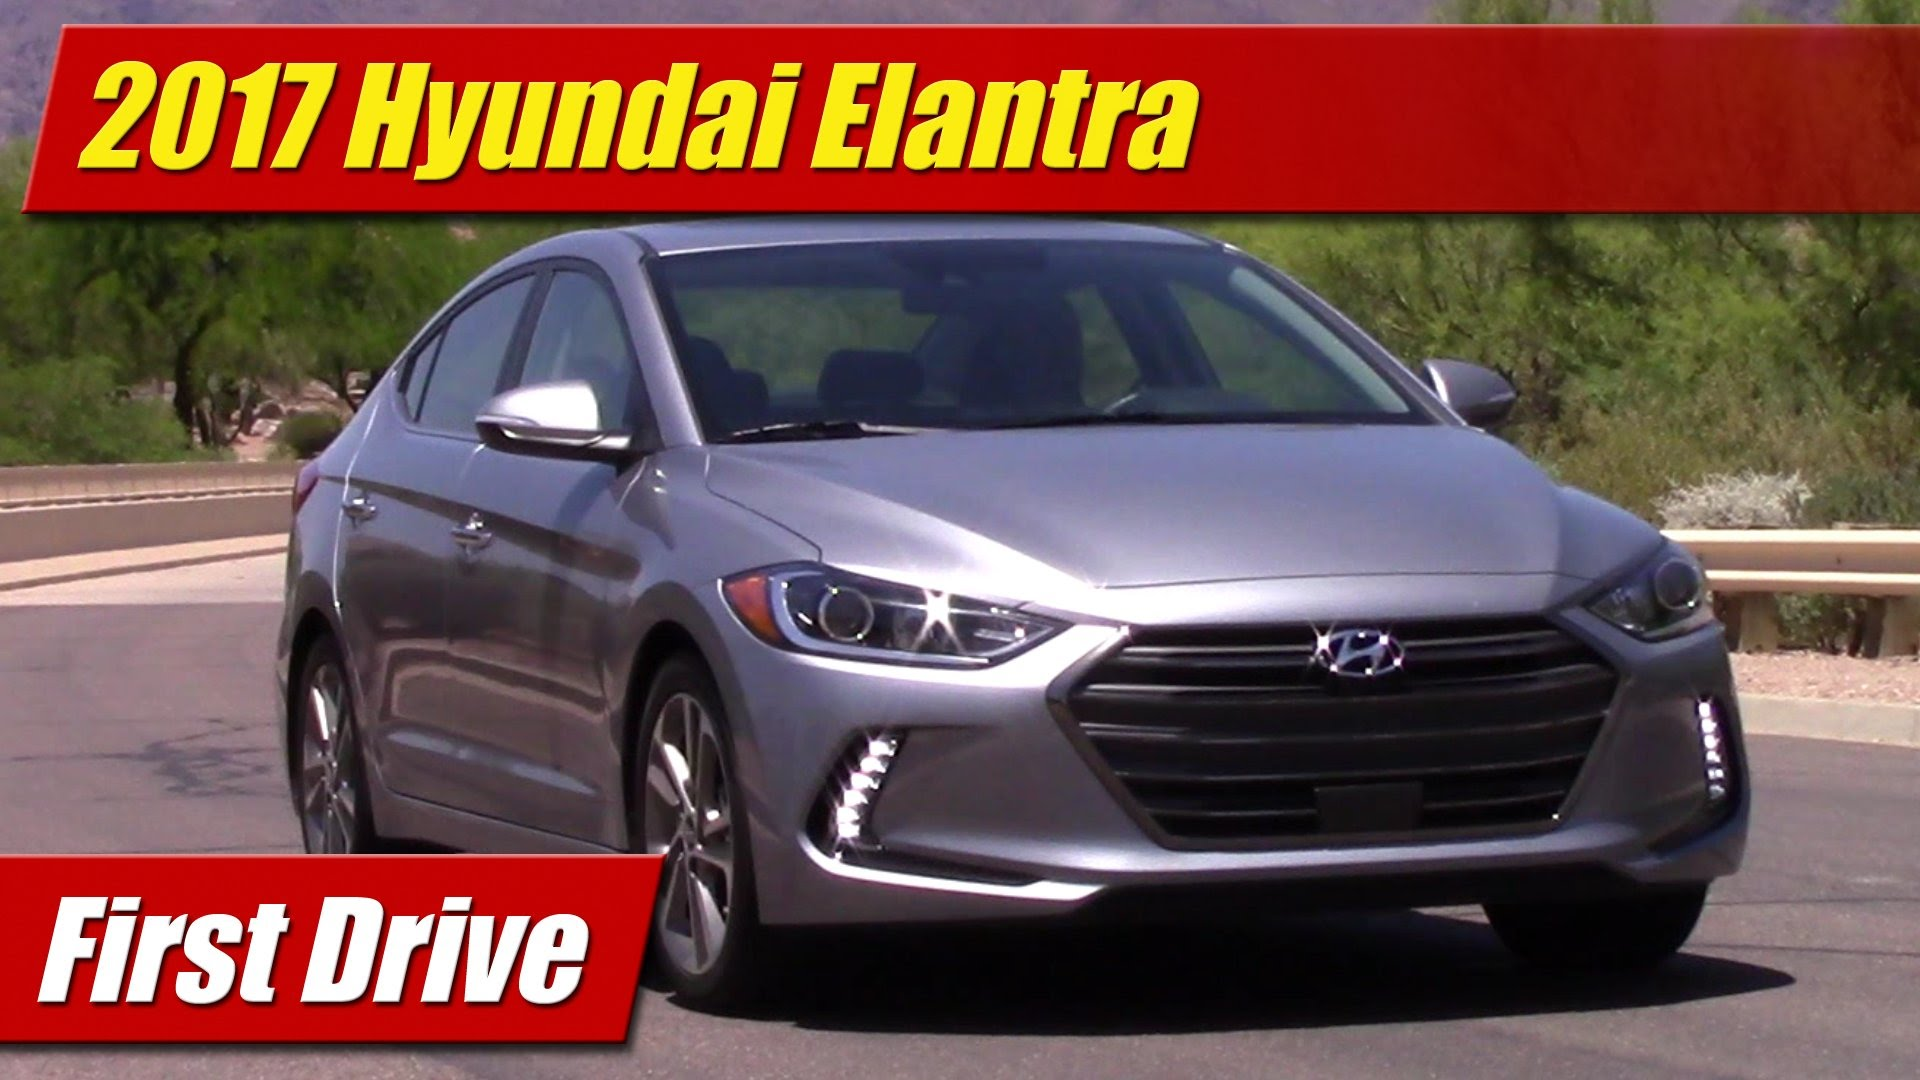 Hyundai Elantra: Driving on grades